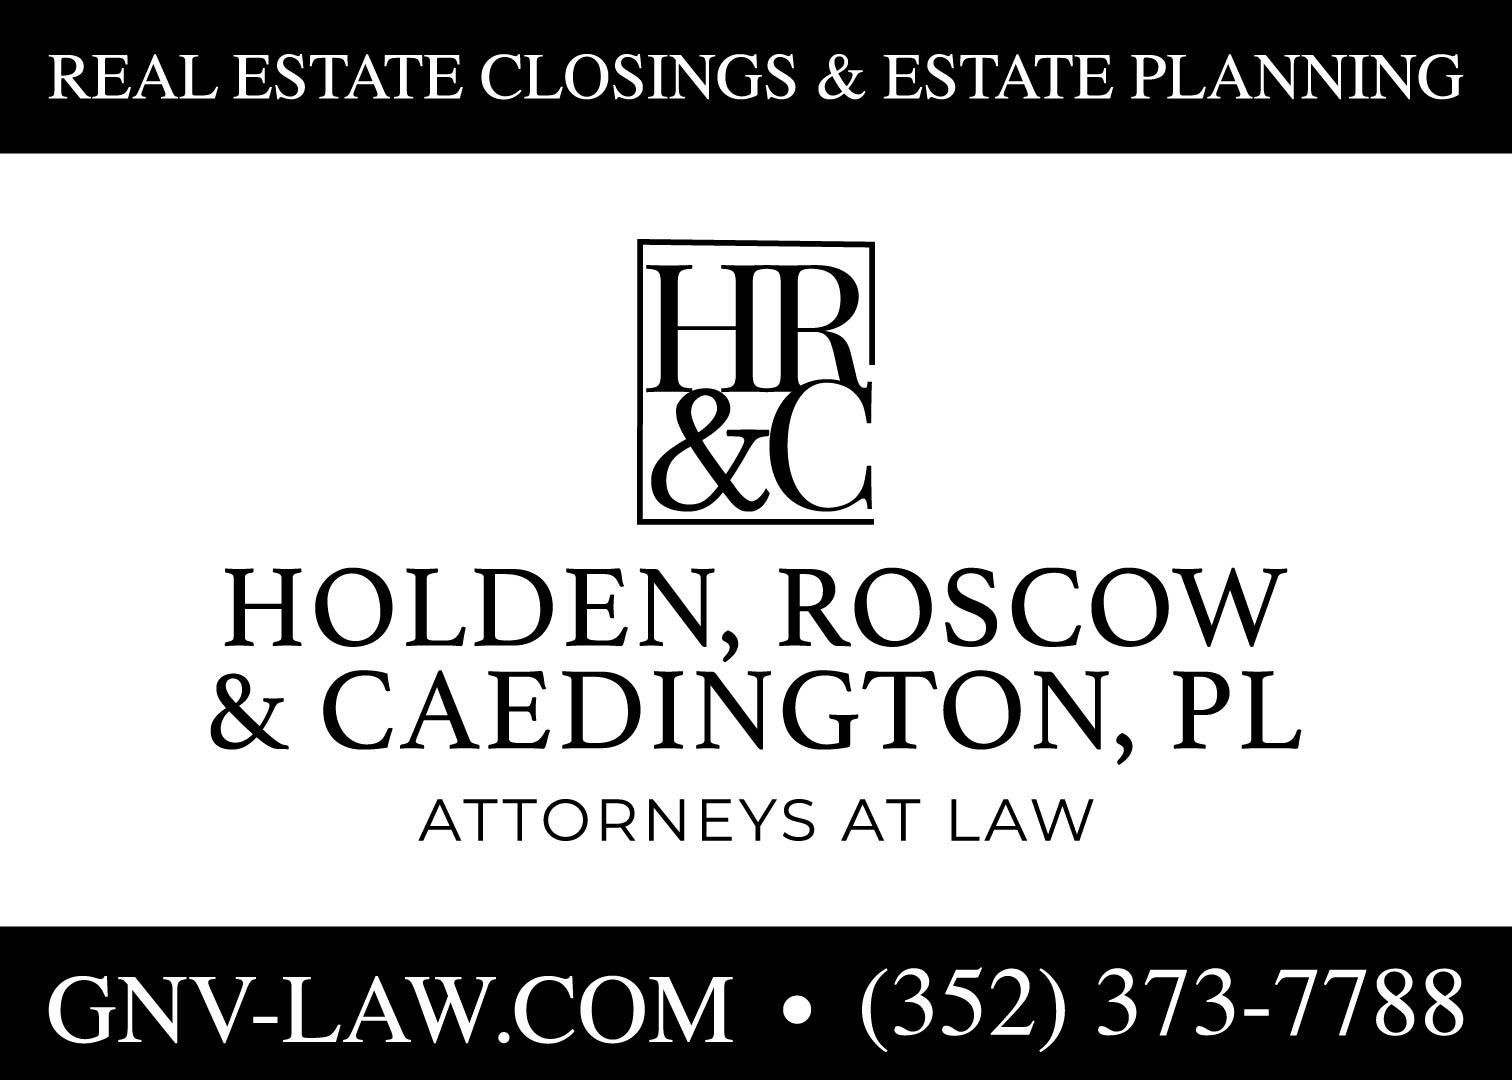 Holden, Roscow, & Caedington, PL